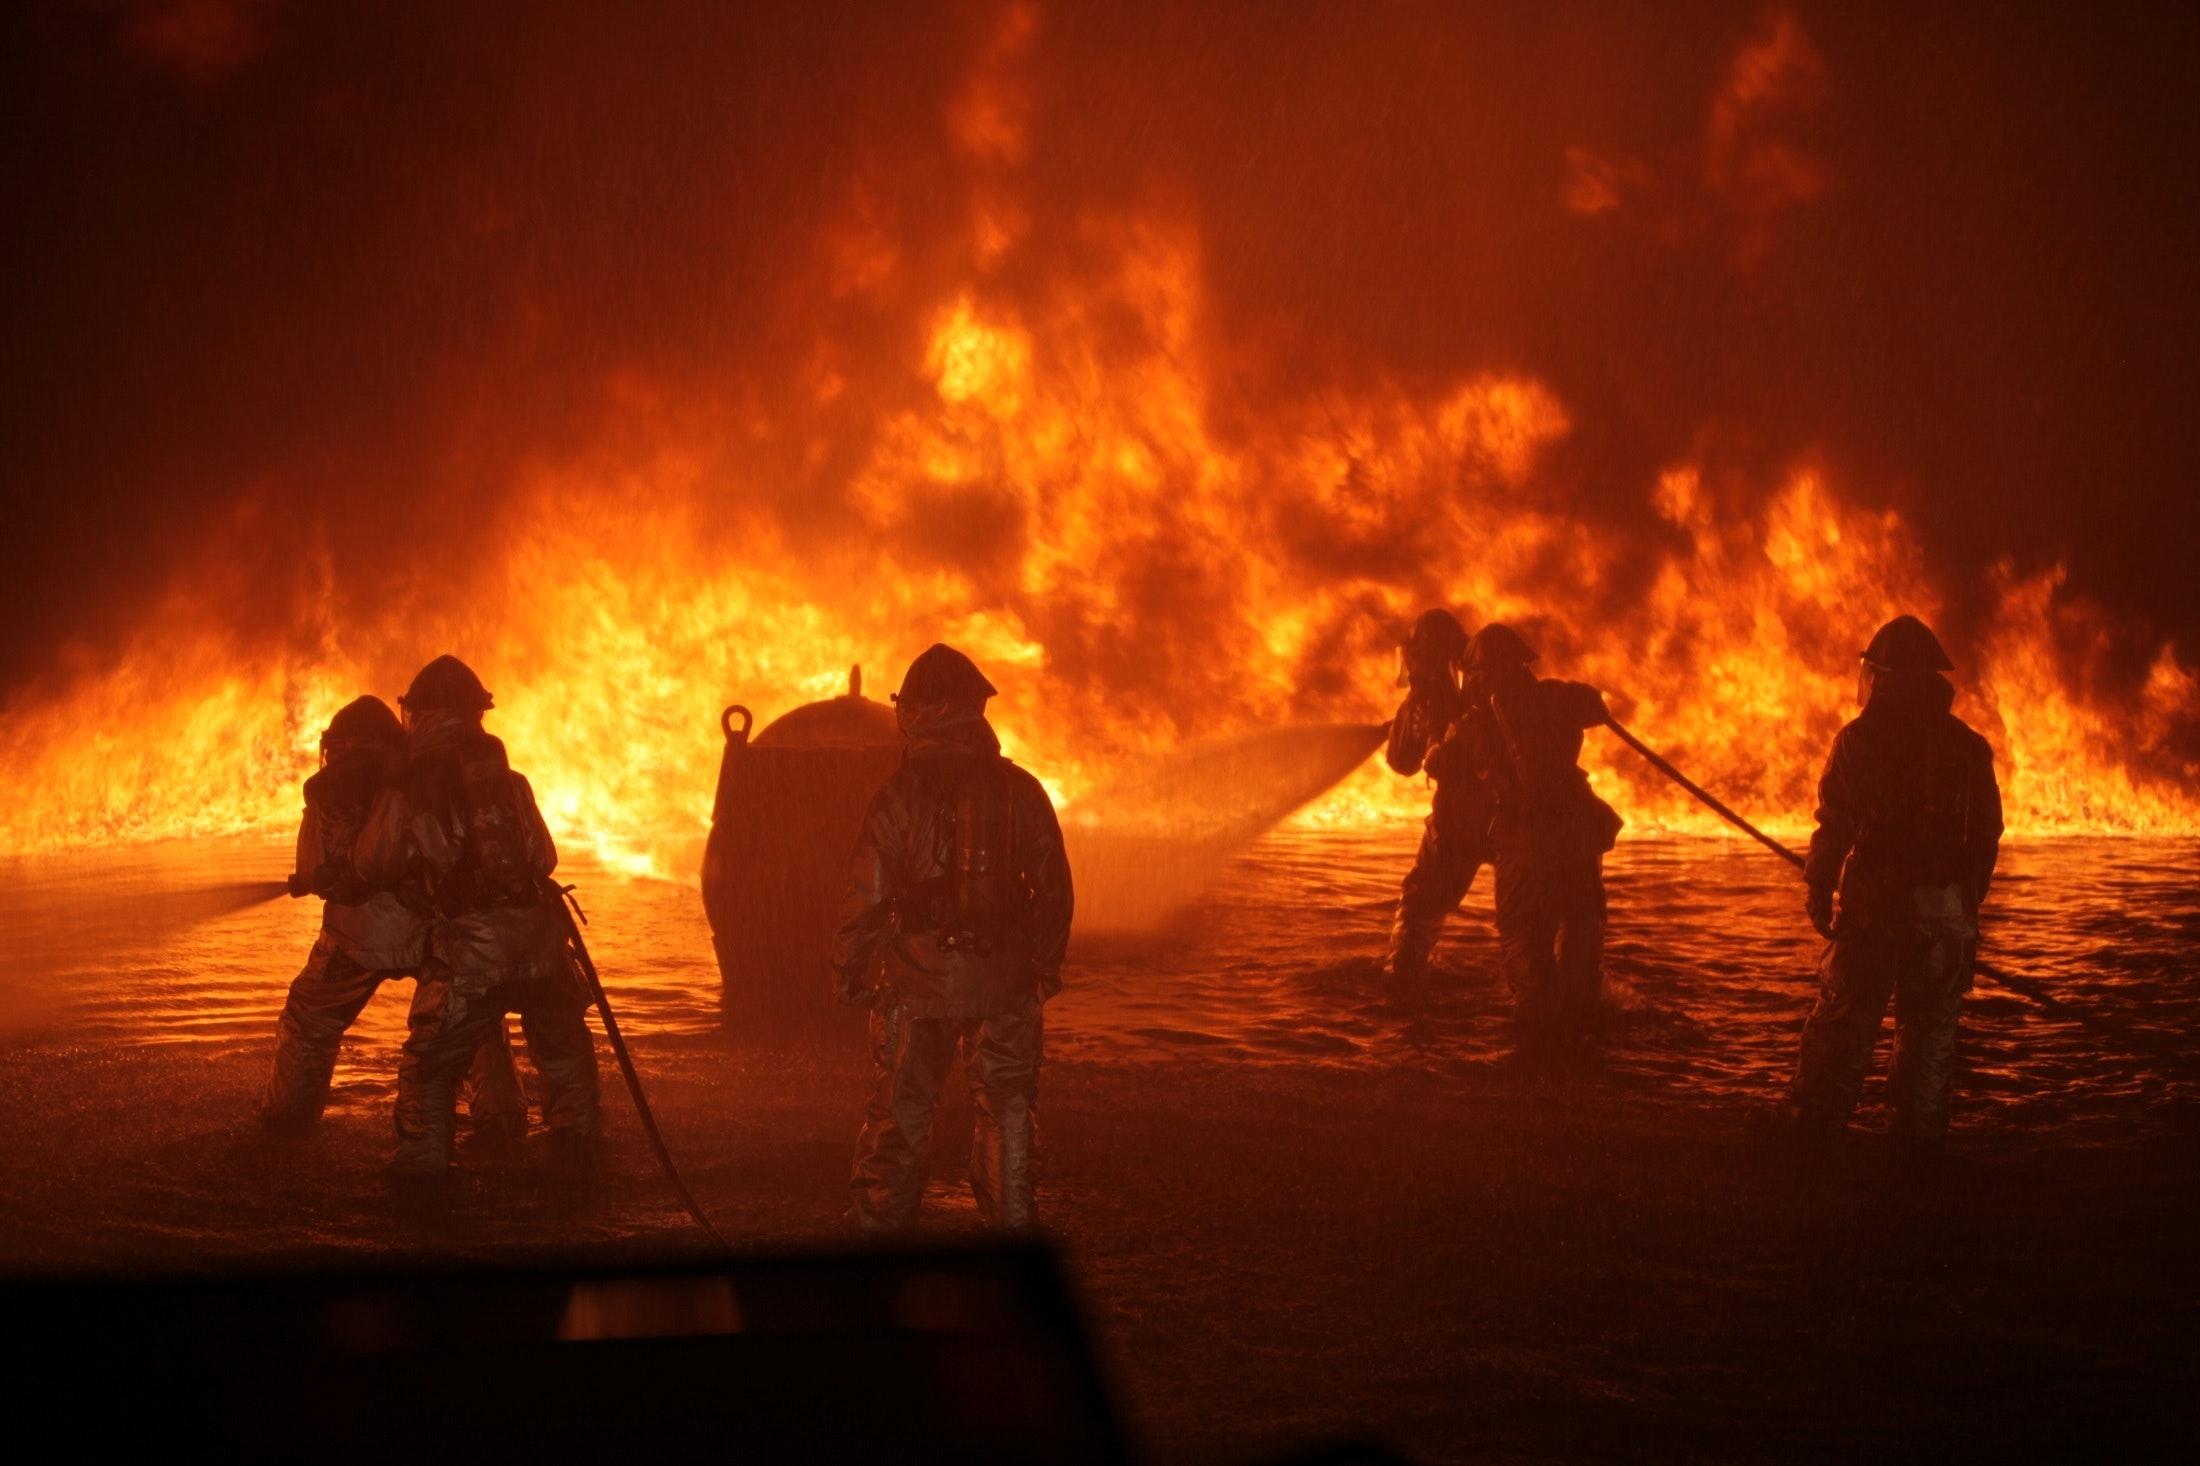 pexels-photo-279979-firefighters.jpeg